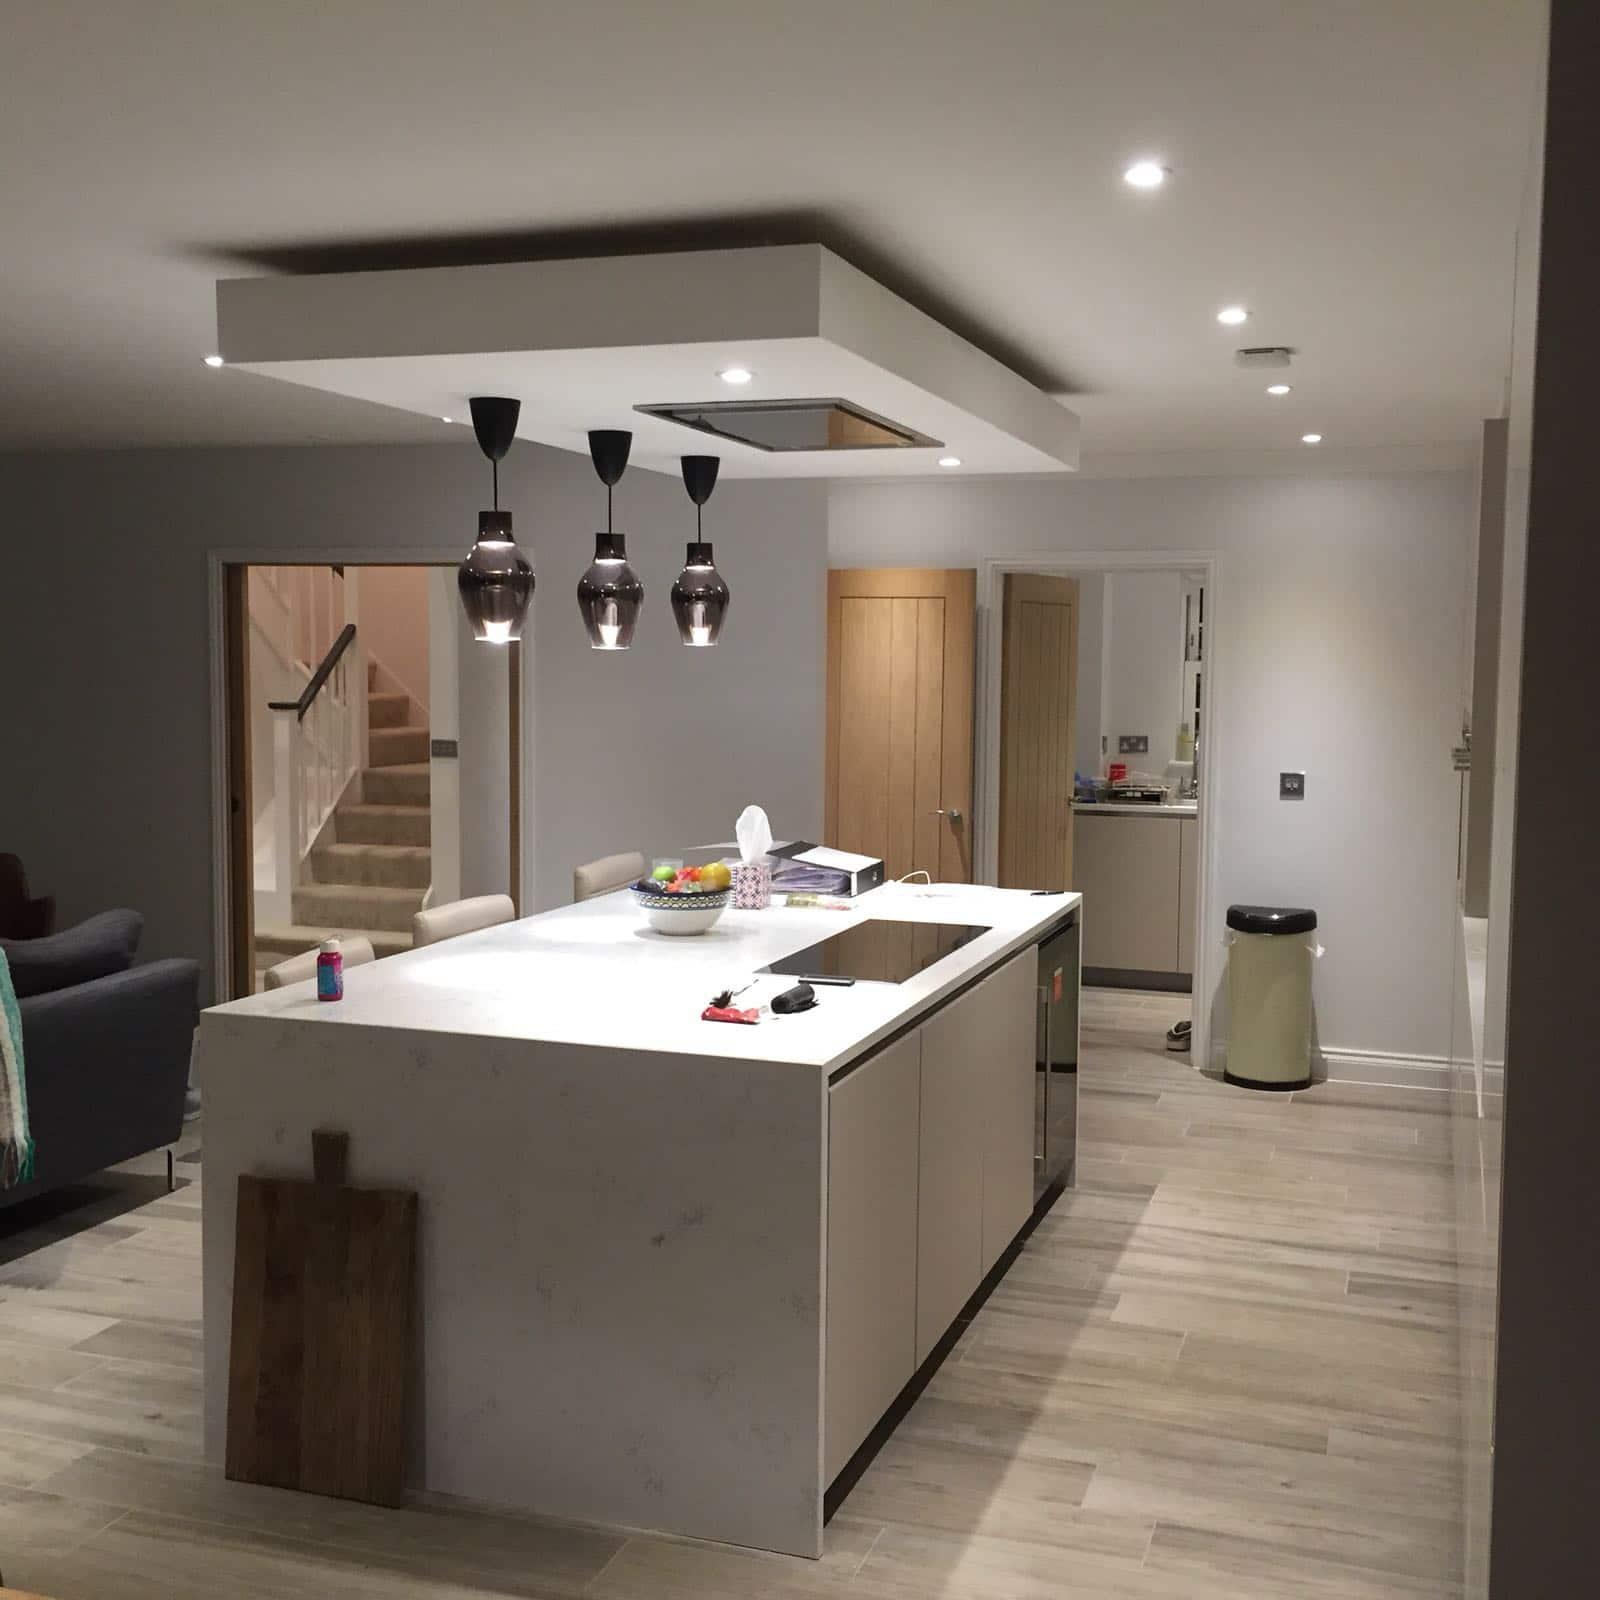 How Ceilings Make You Feel Rock and Co Granite Ltd